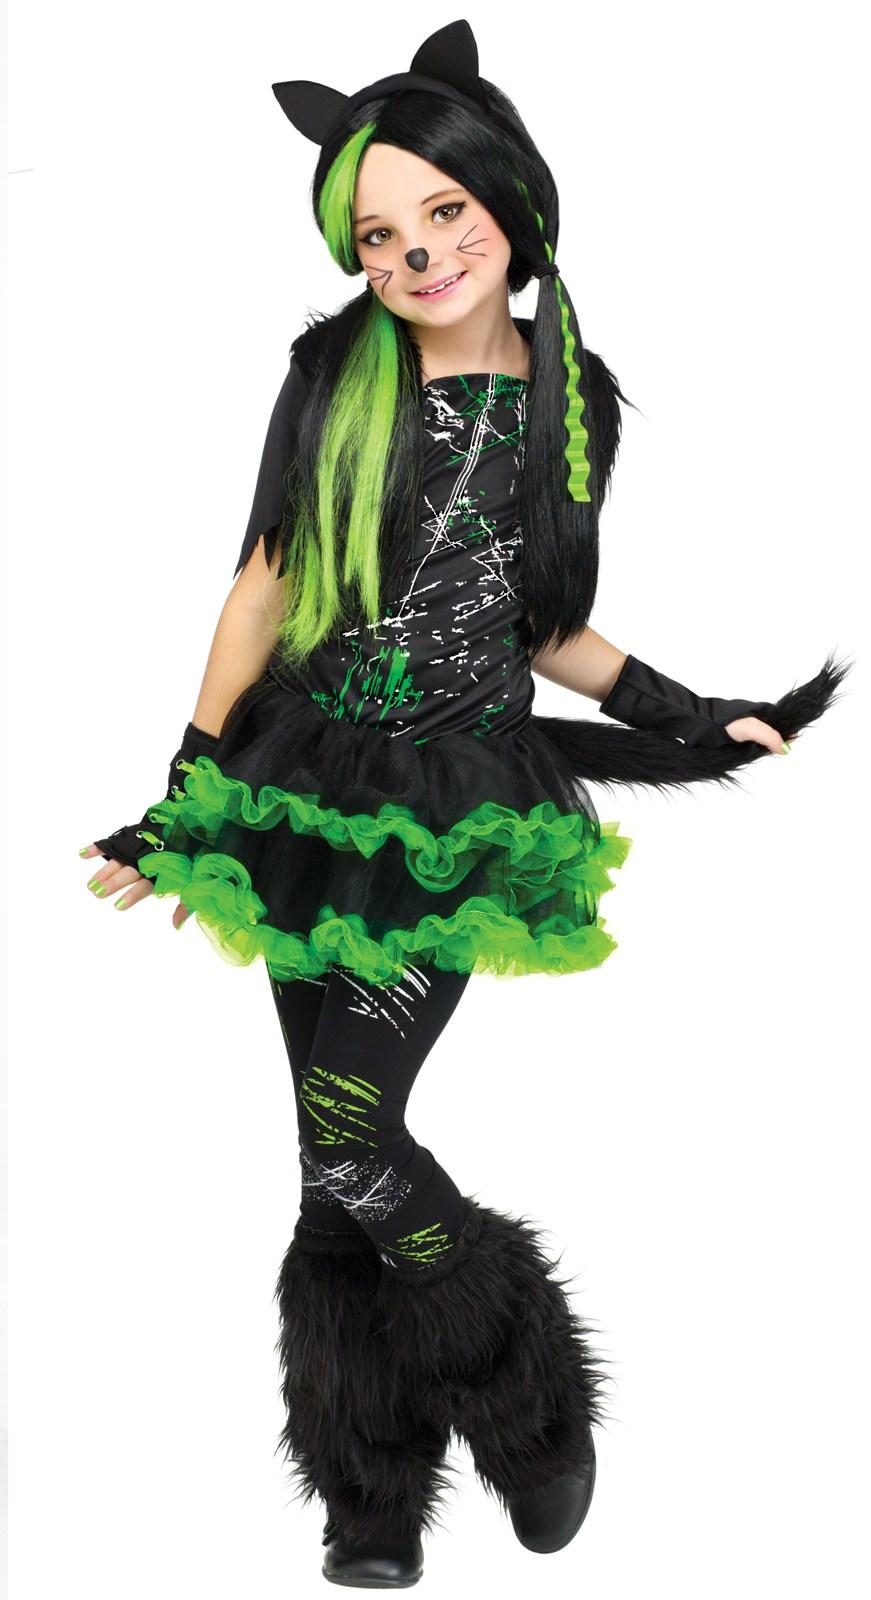 Kool Kat Child Costume   BuyCostumes.com